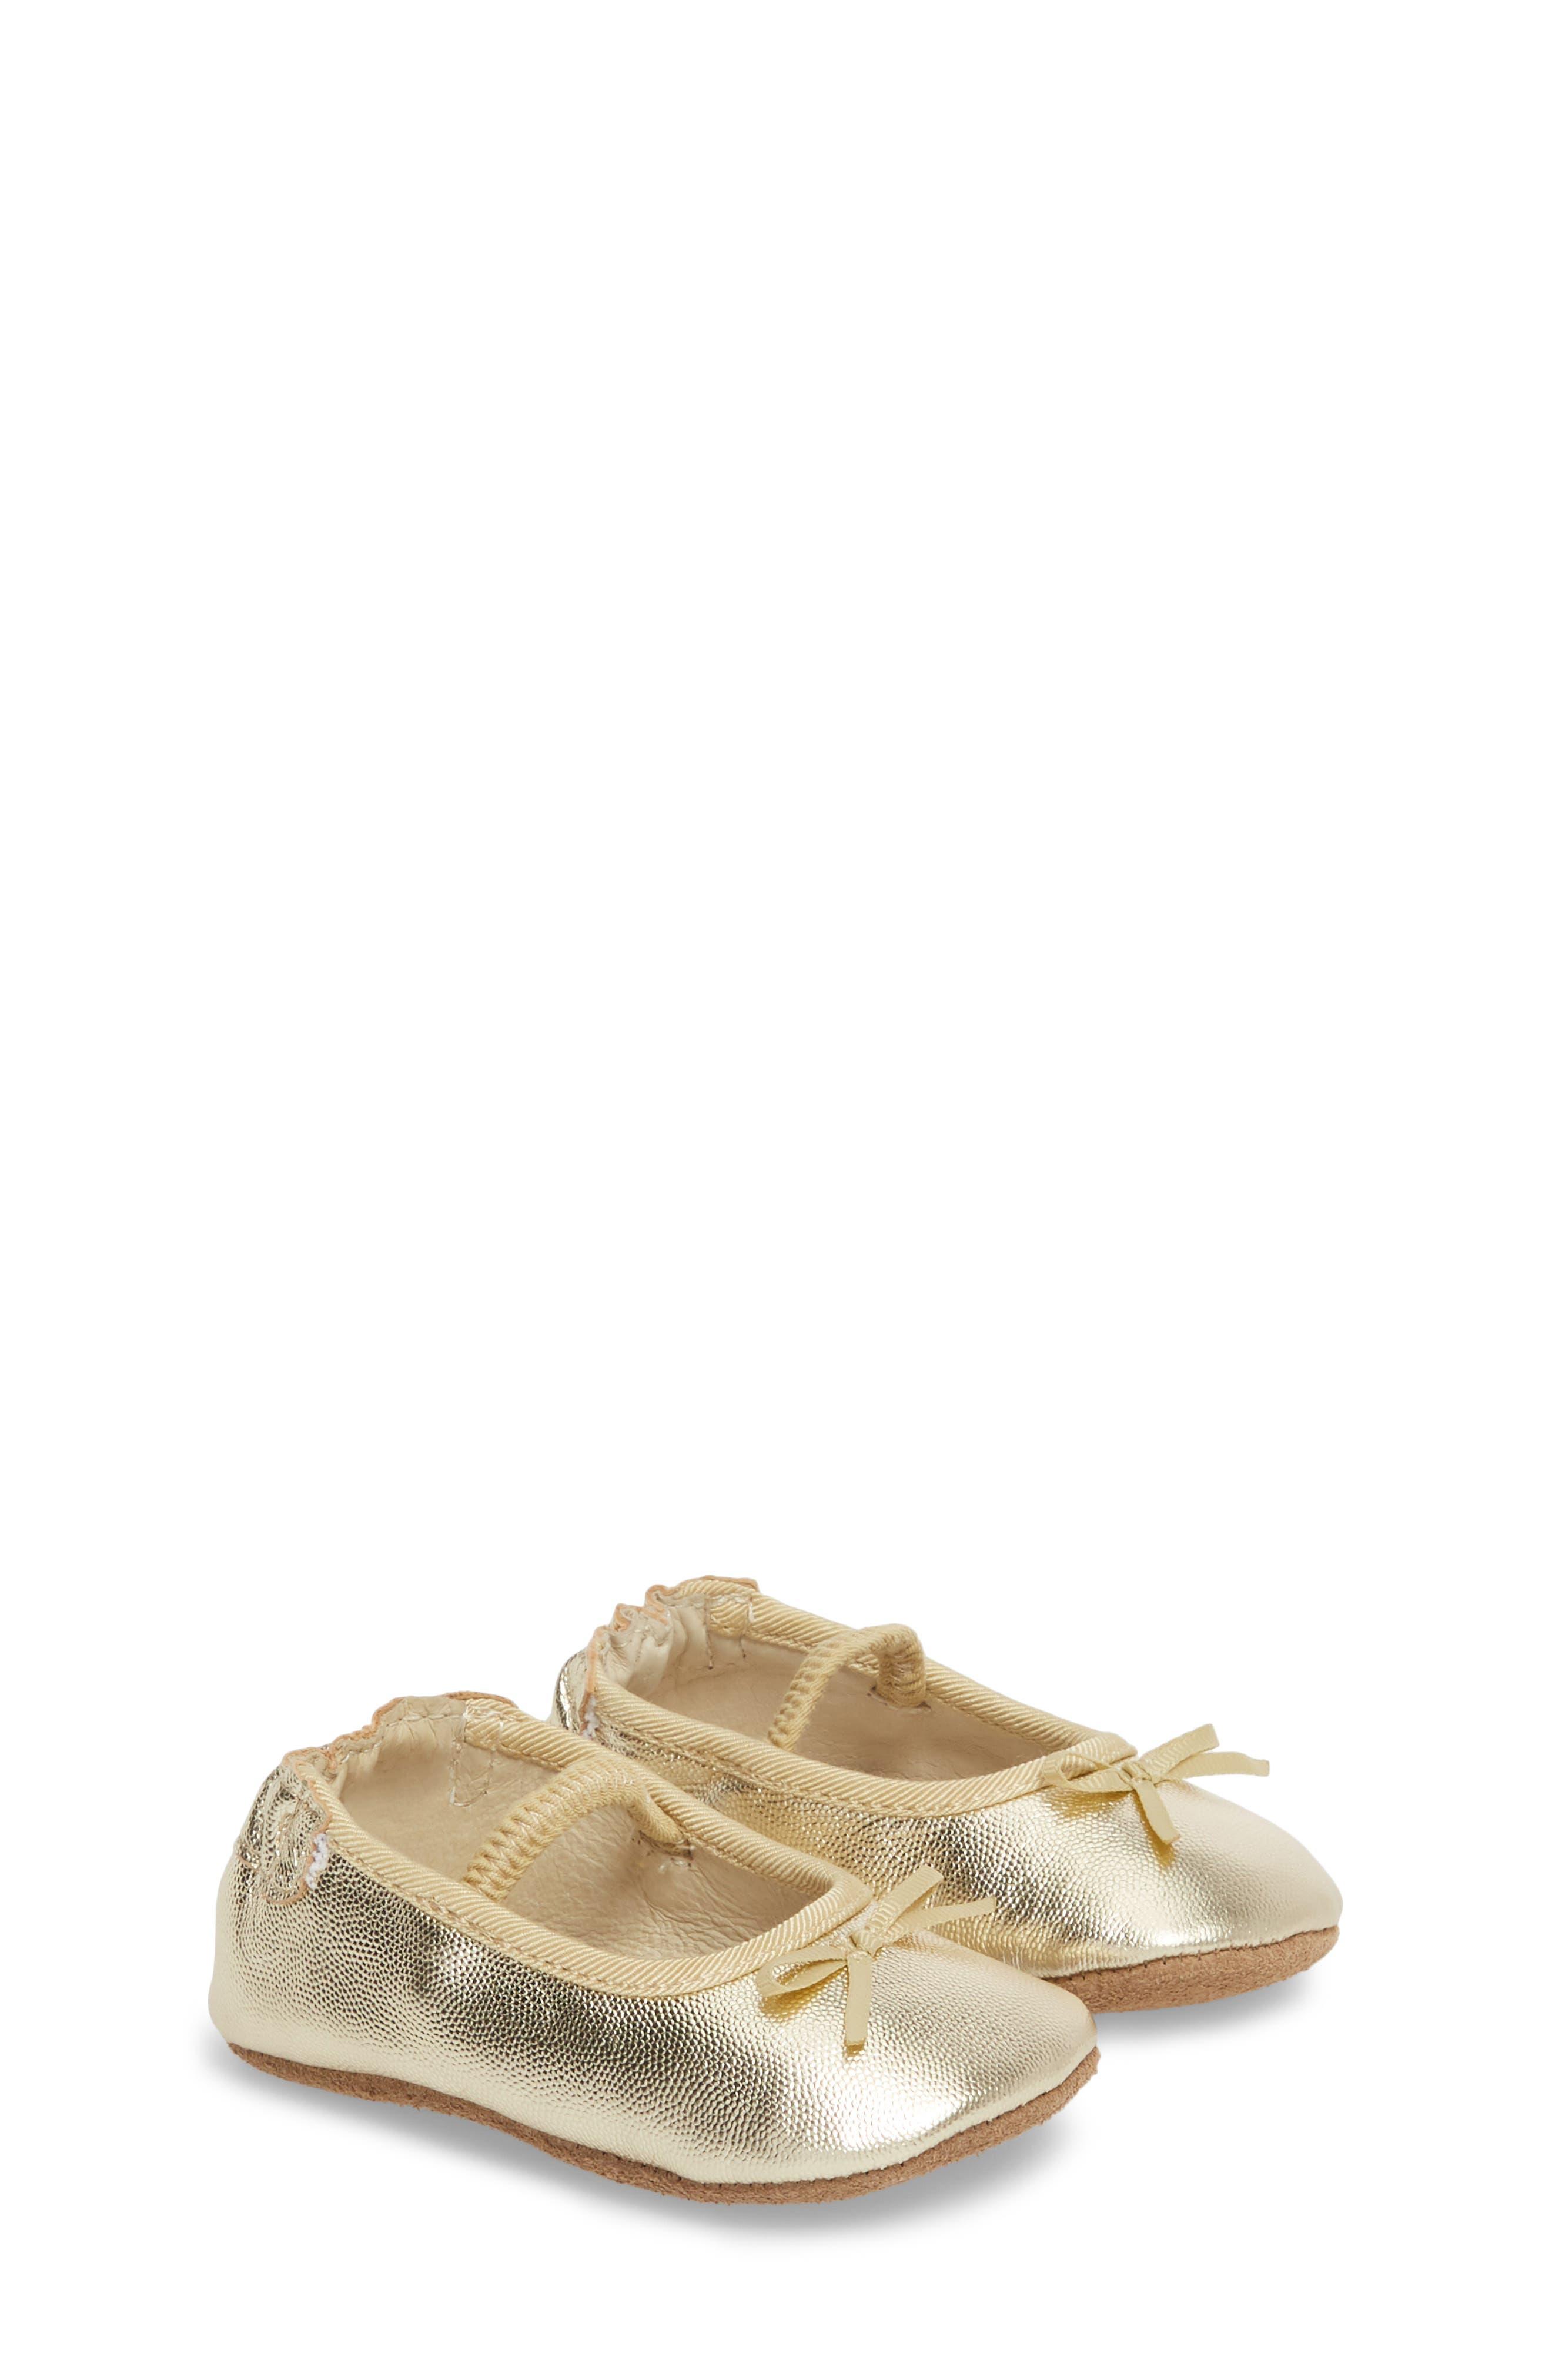 ROBEEZ<SUP>®</SUP>, Athena Ballet Strap Crib Shoe, Main thumbnail 1, color, GOLD